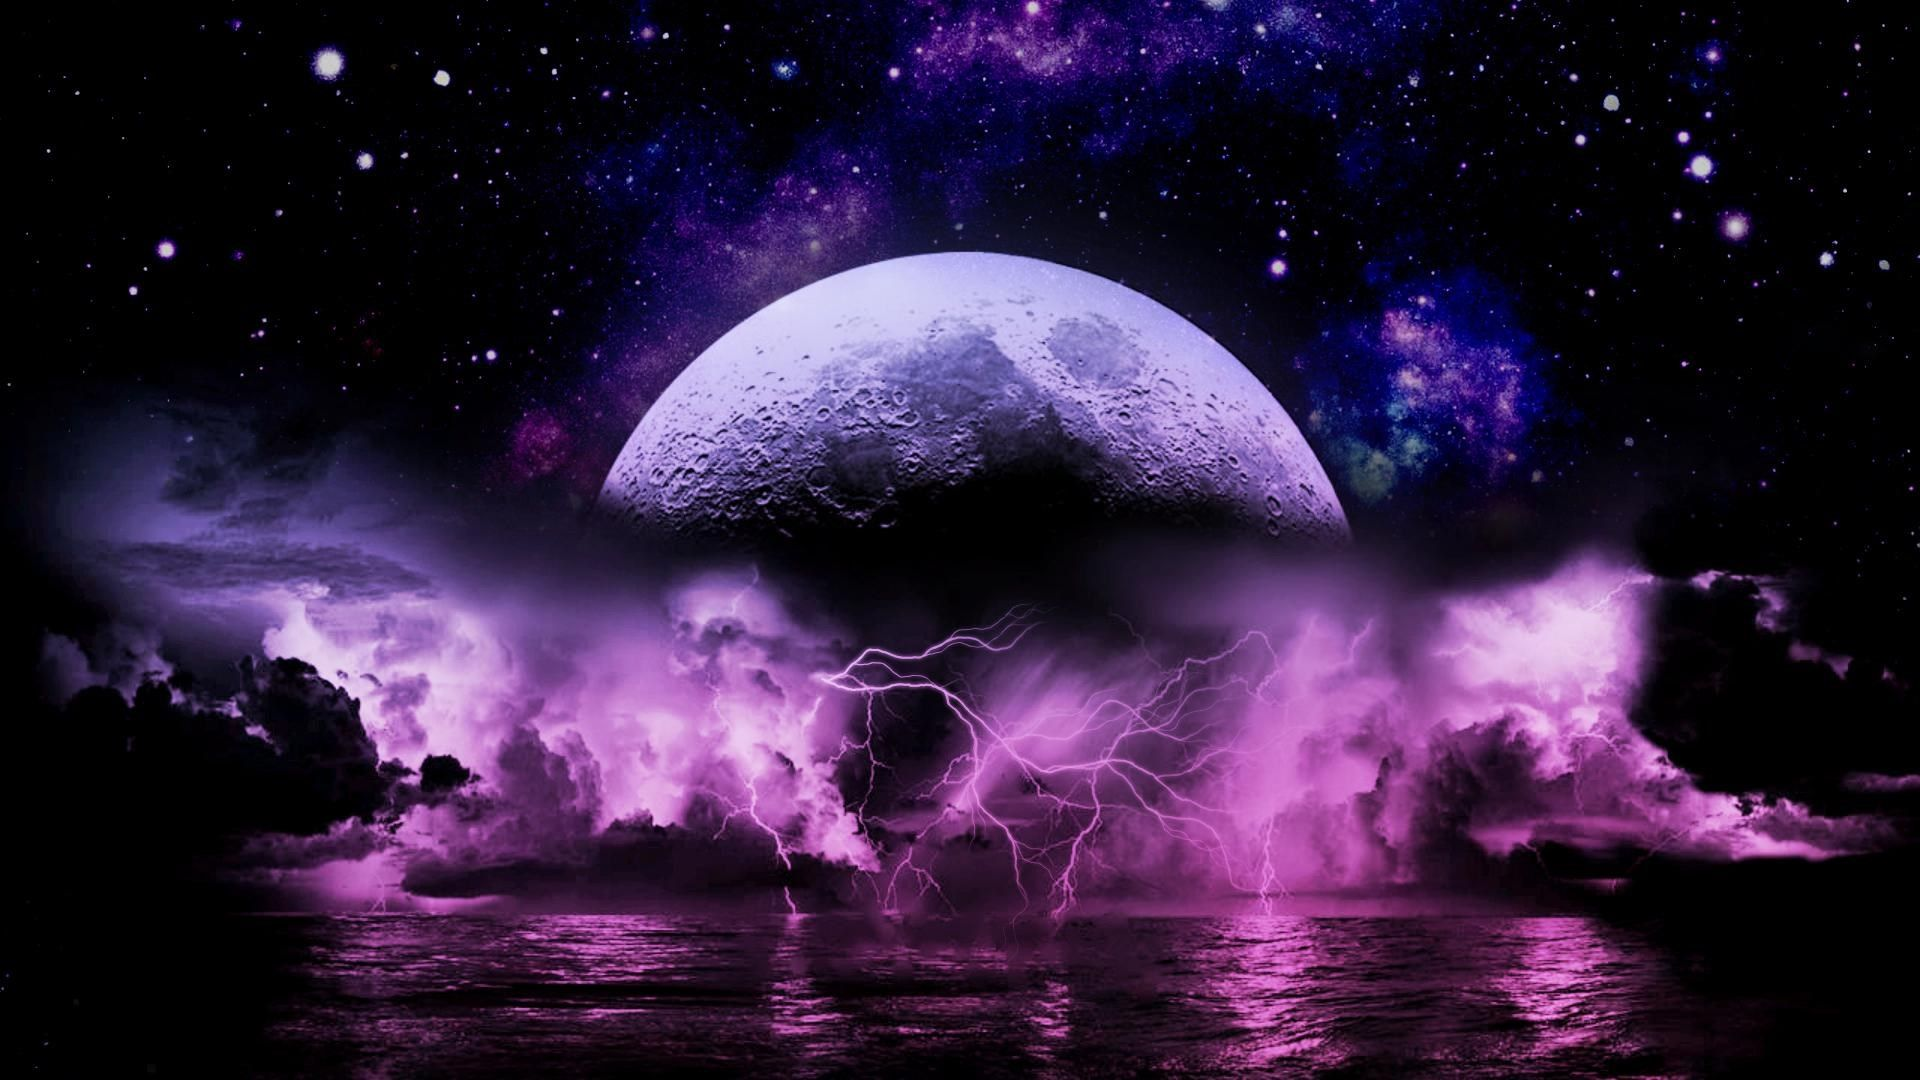 Cool Wallpaper Horse Lightning - 3305e028ba7bab27e84449028f8e5cfd  Trends_759834.jpg